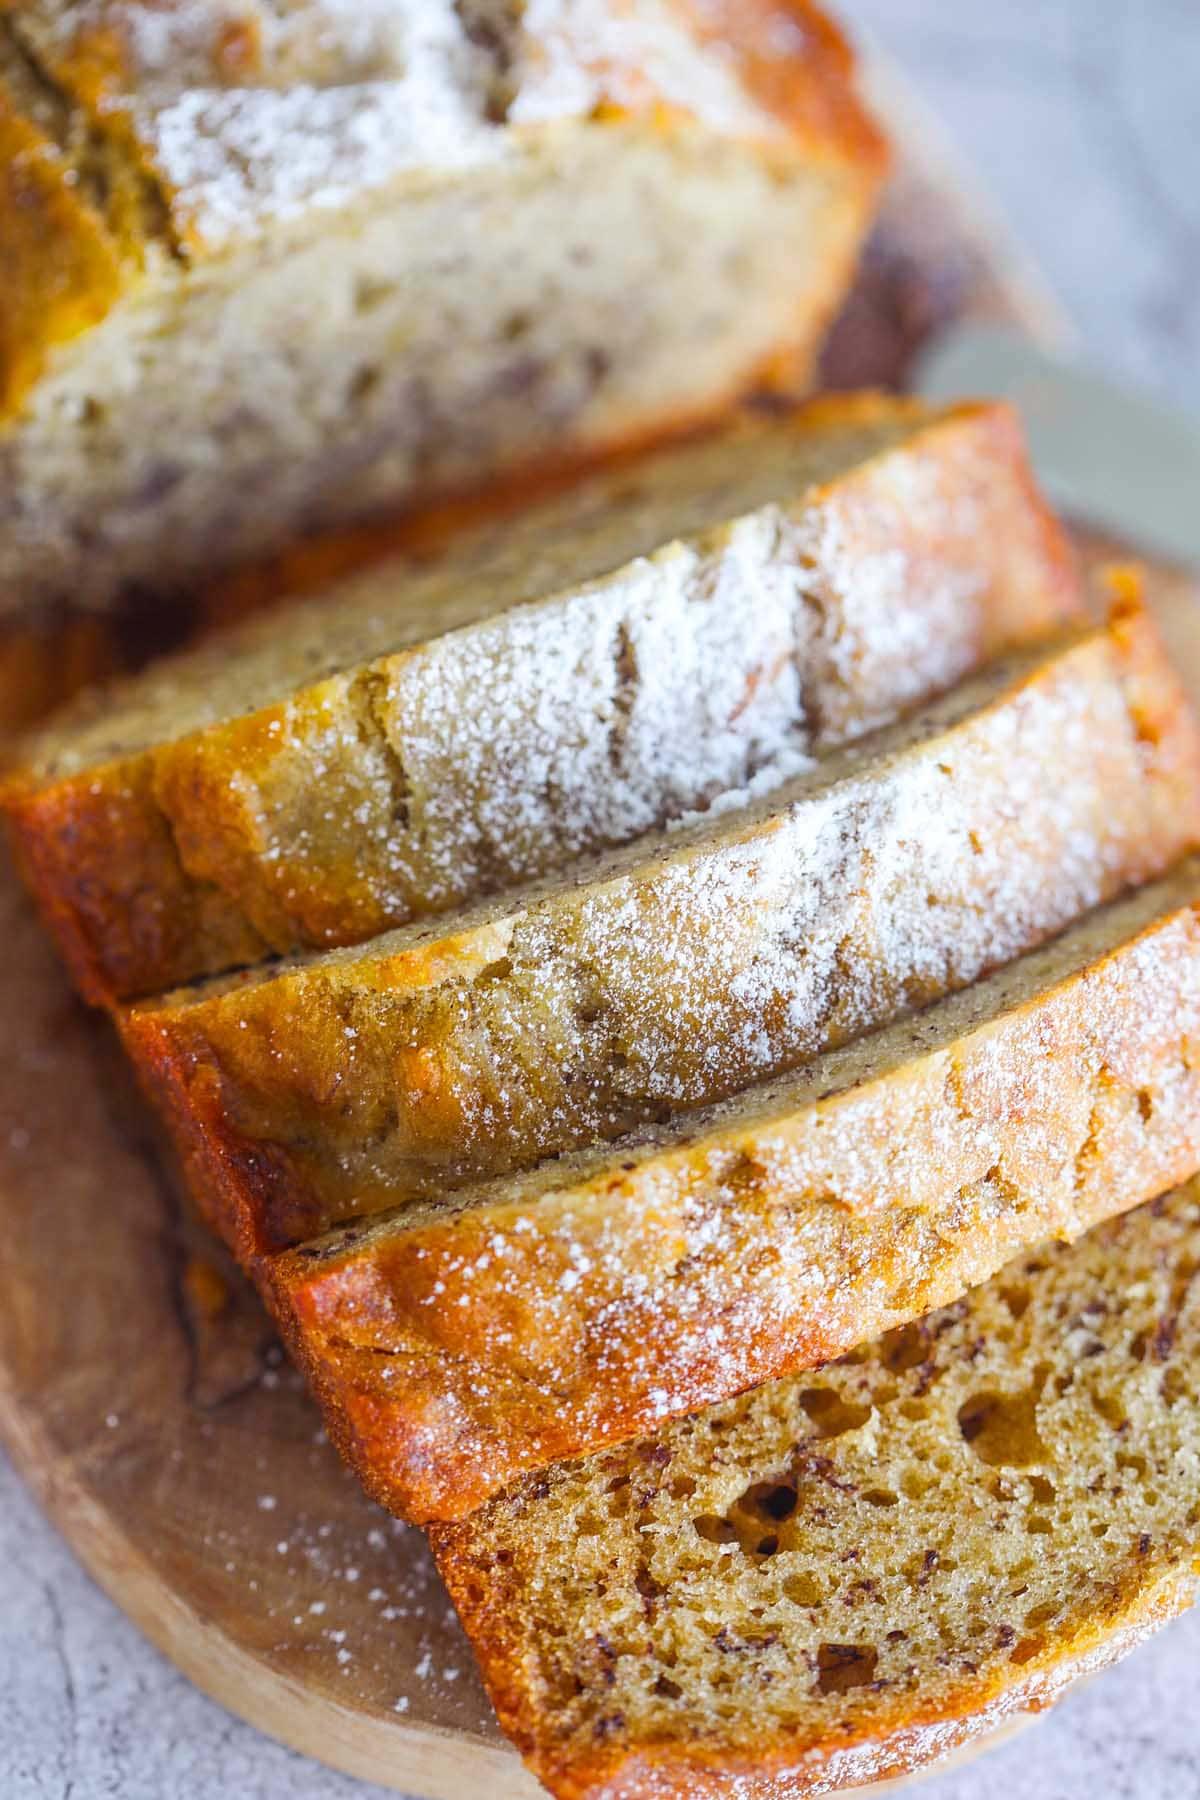 Moist banana bread on a serving platter.